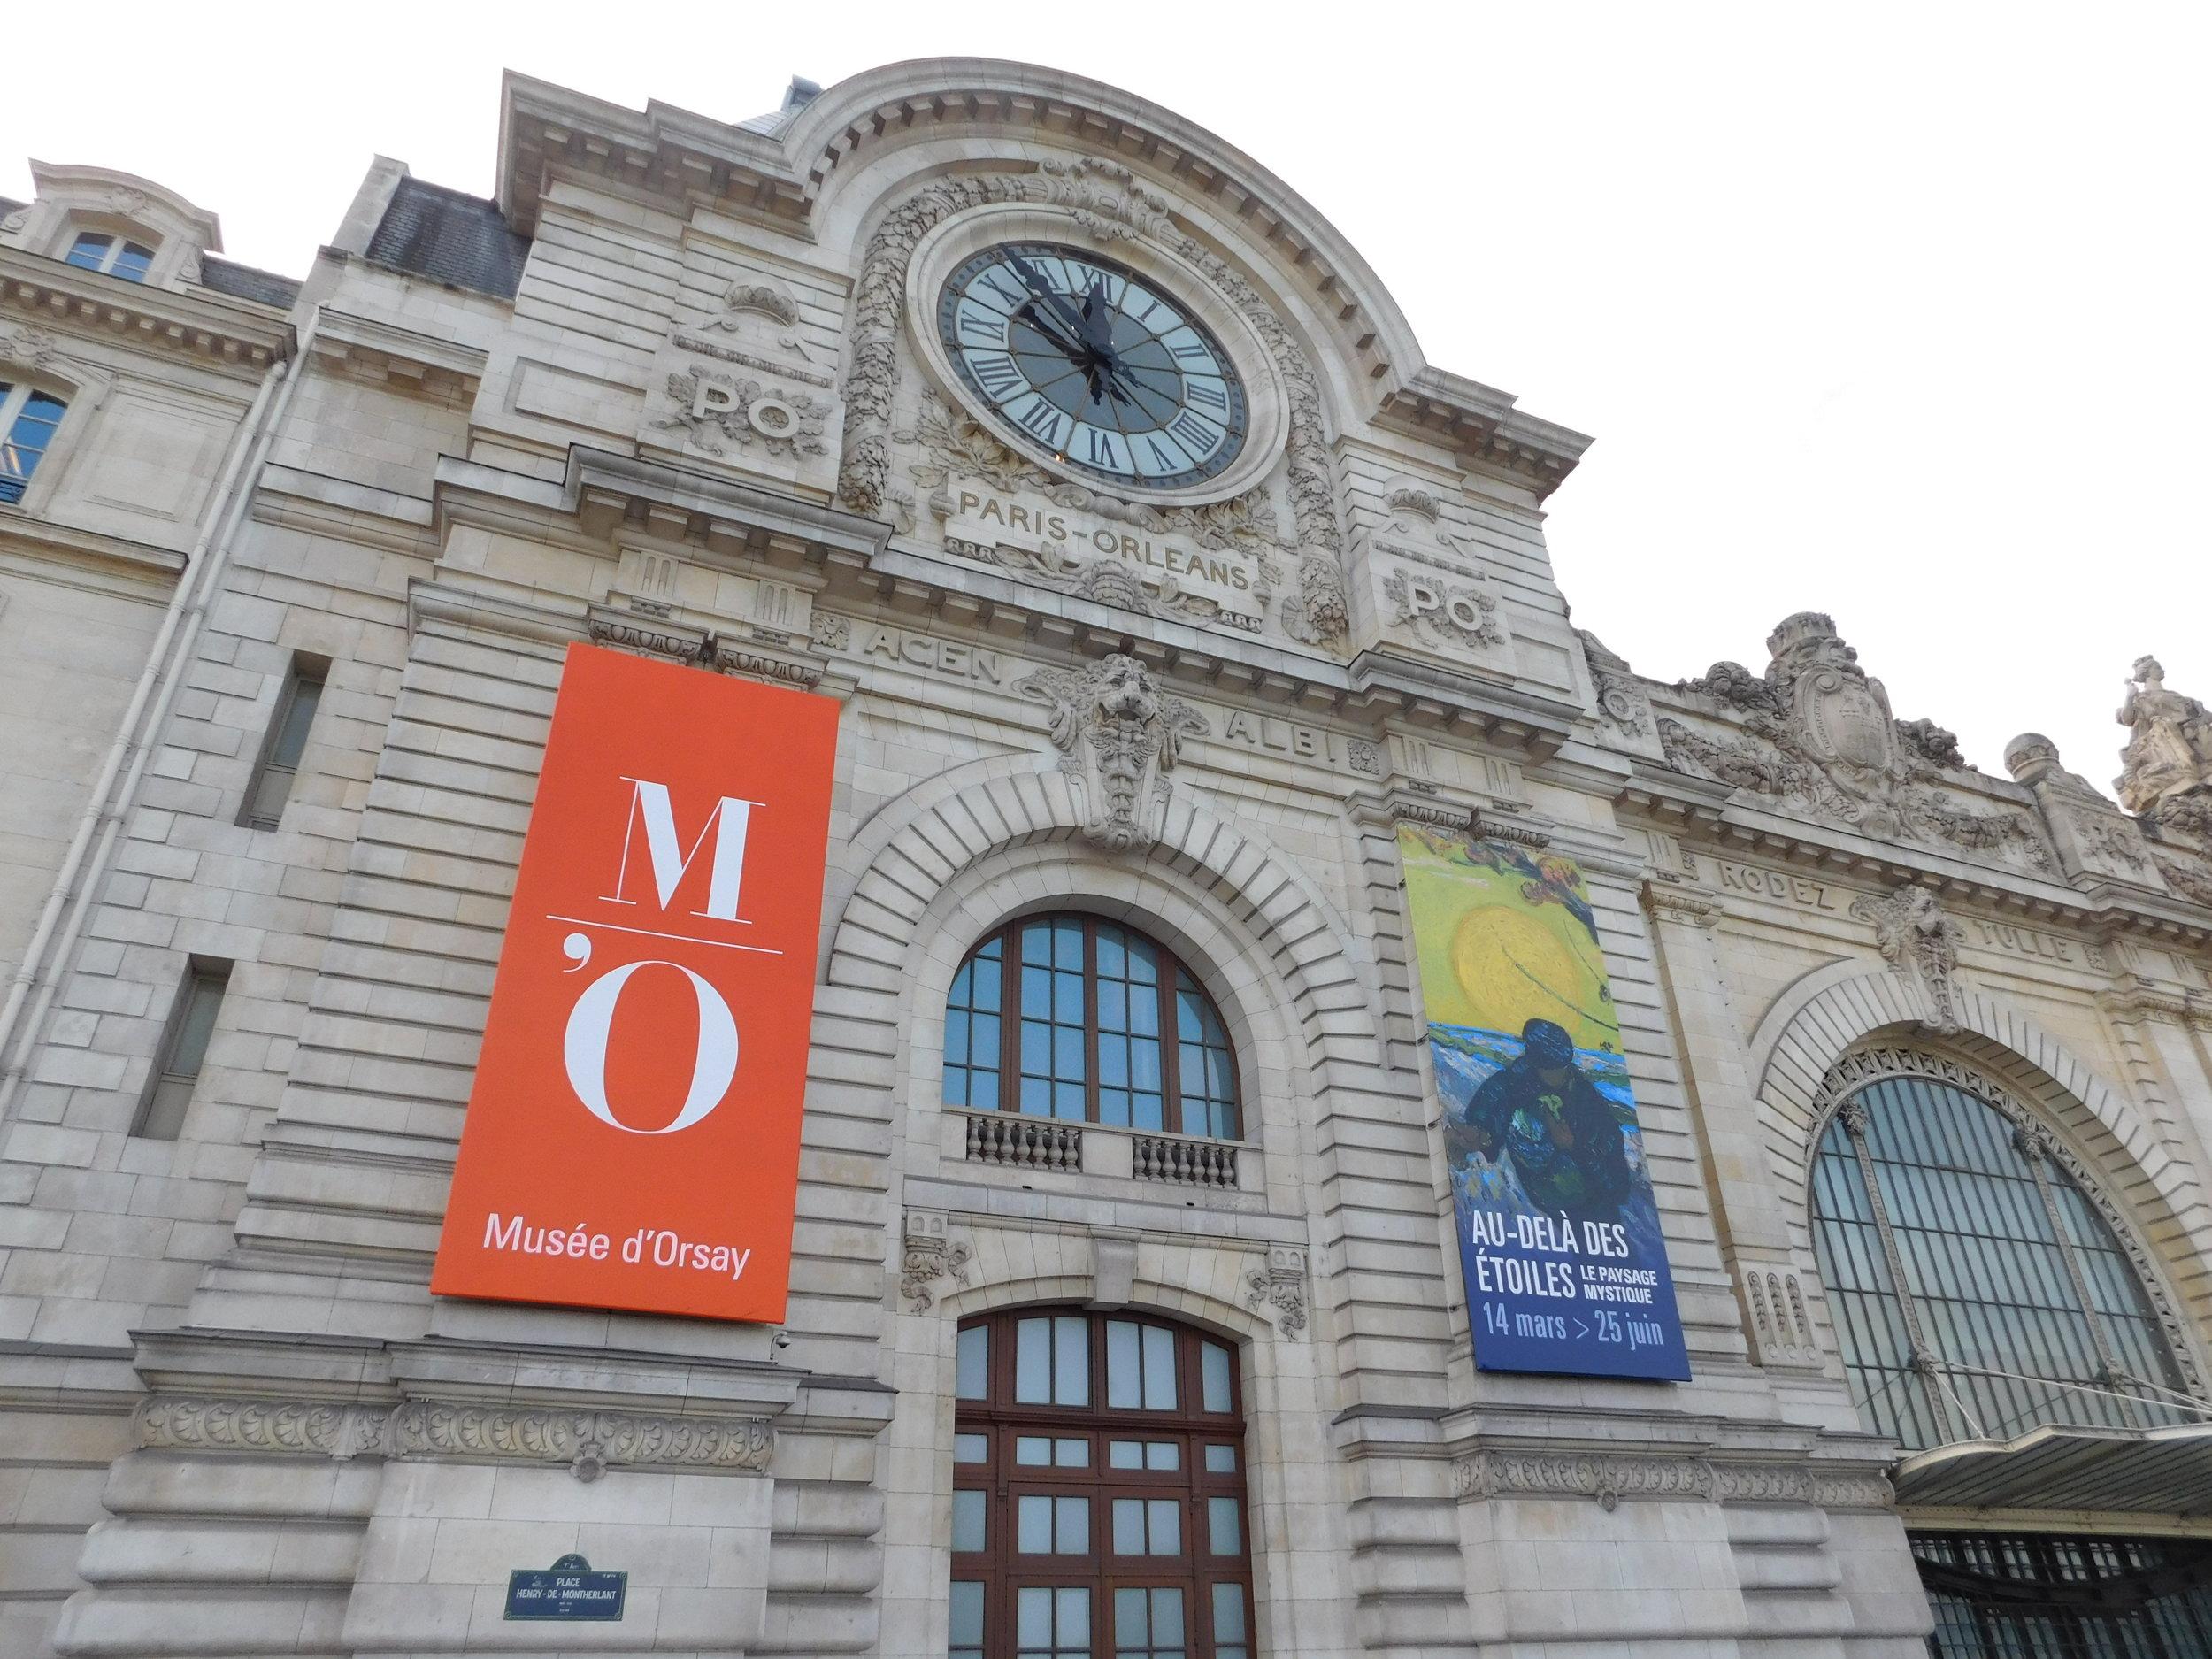 Musée d'Orsay group trip